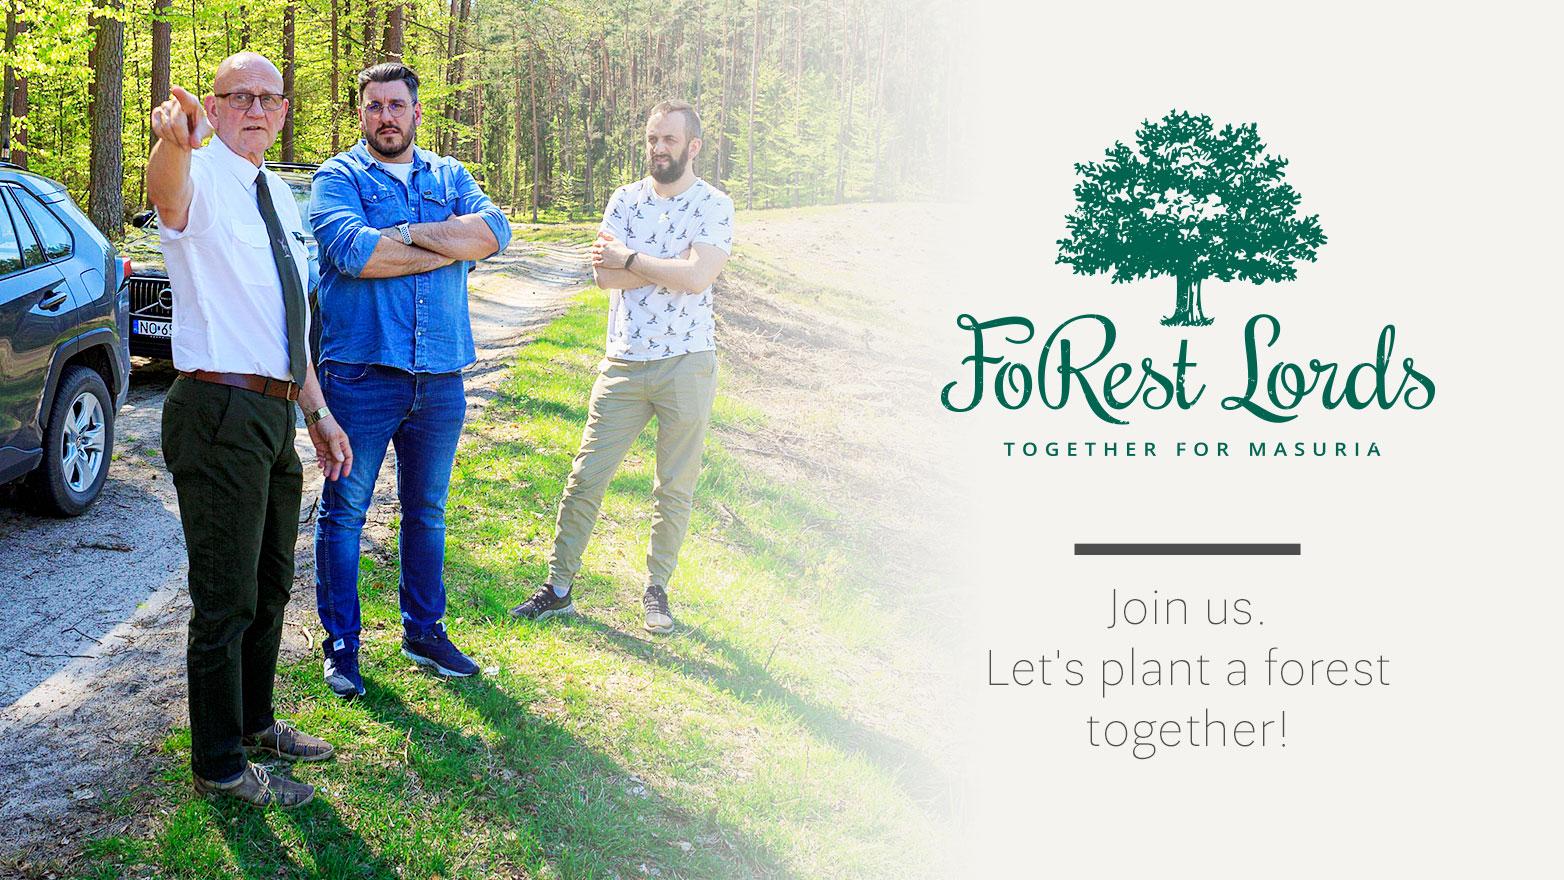 forest lords wspolnie dla mazur Blog ENG